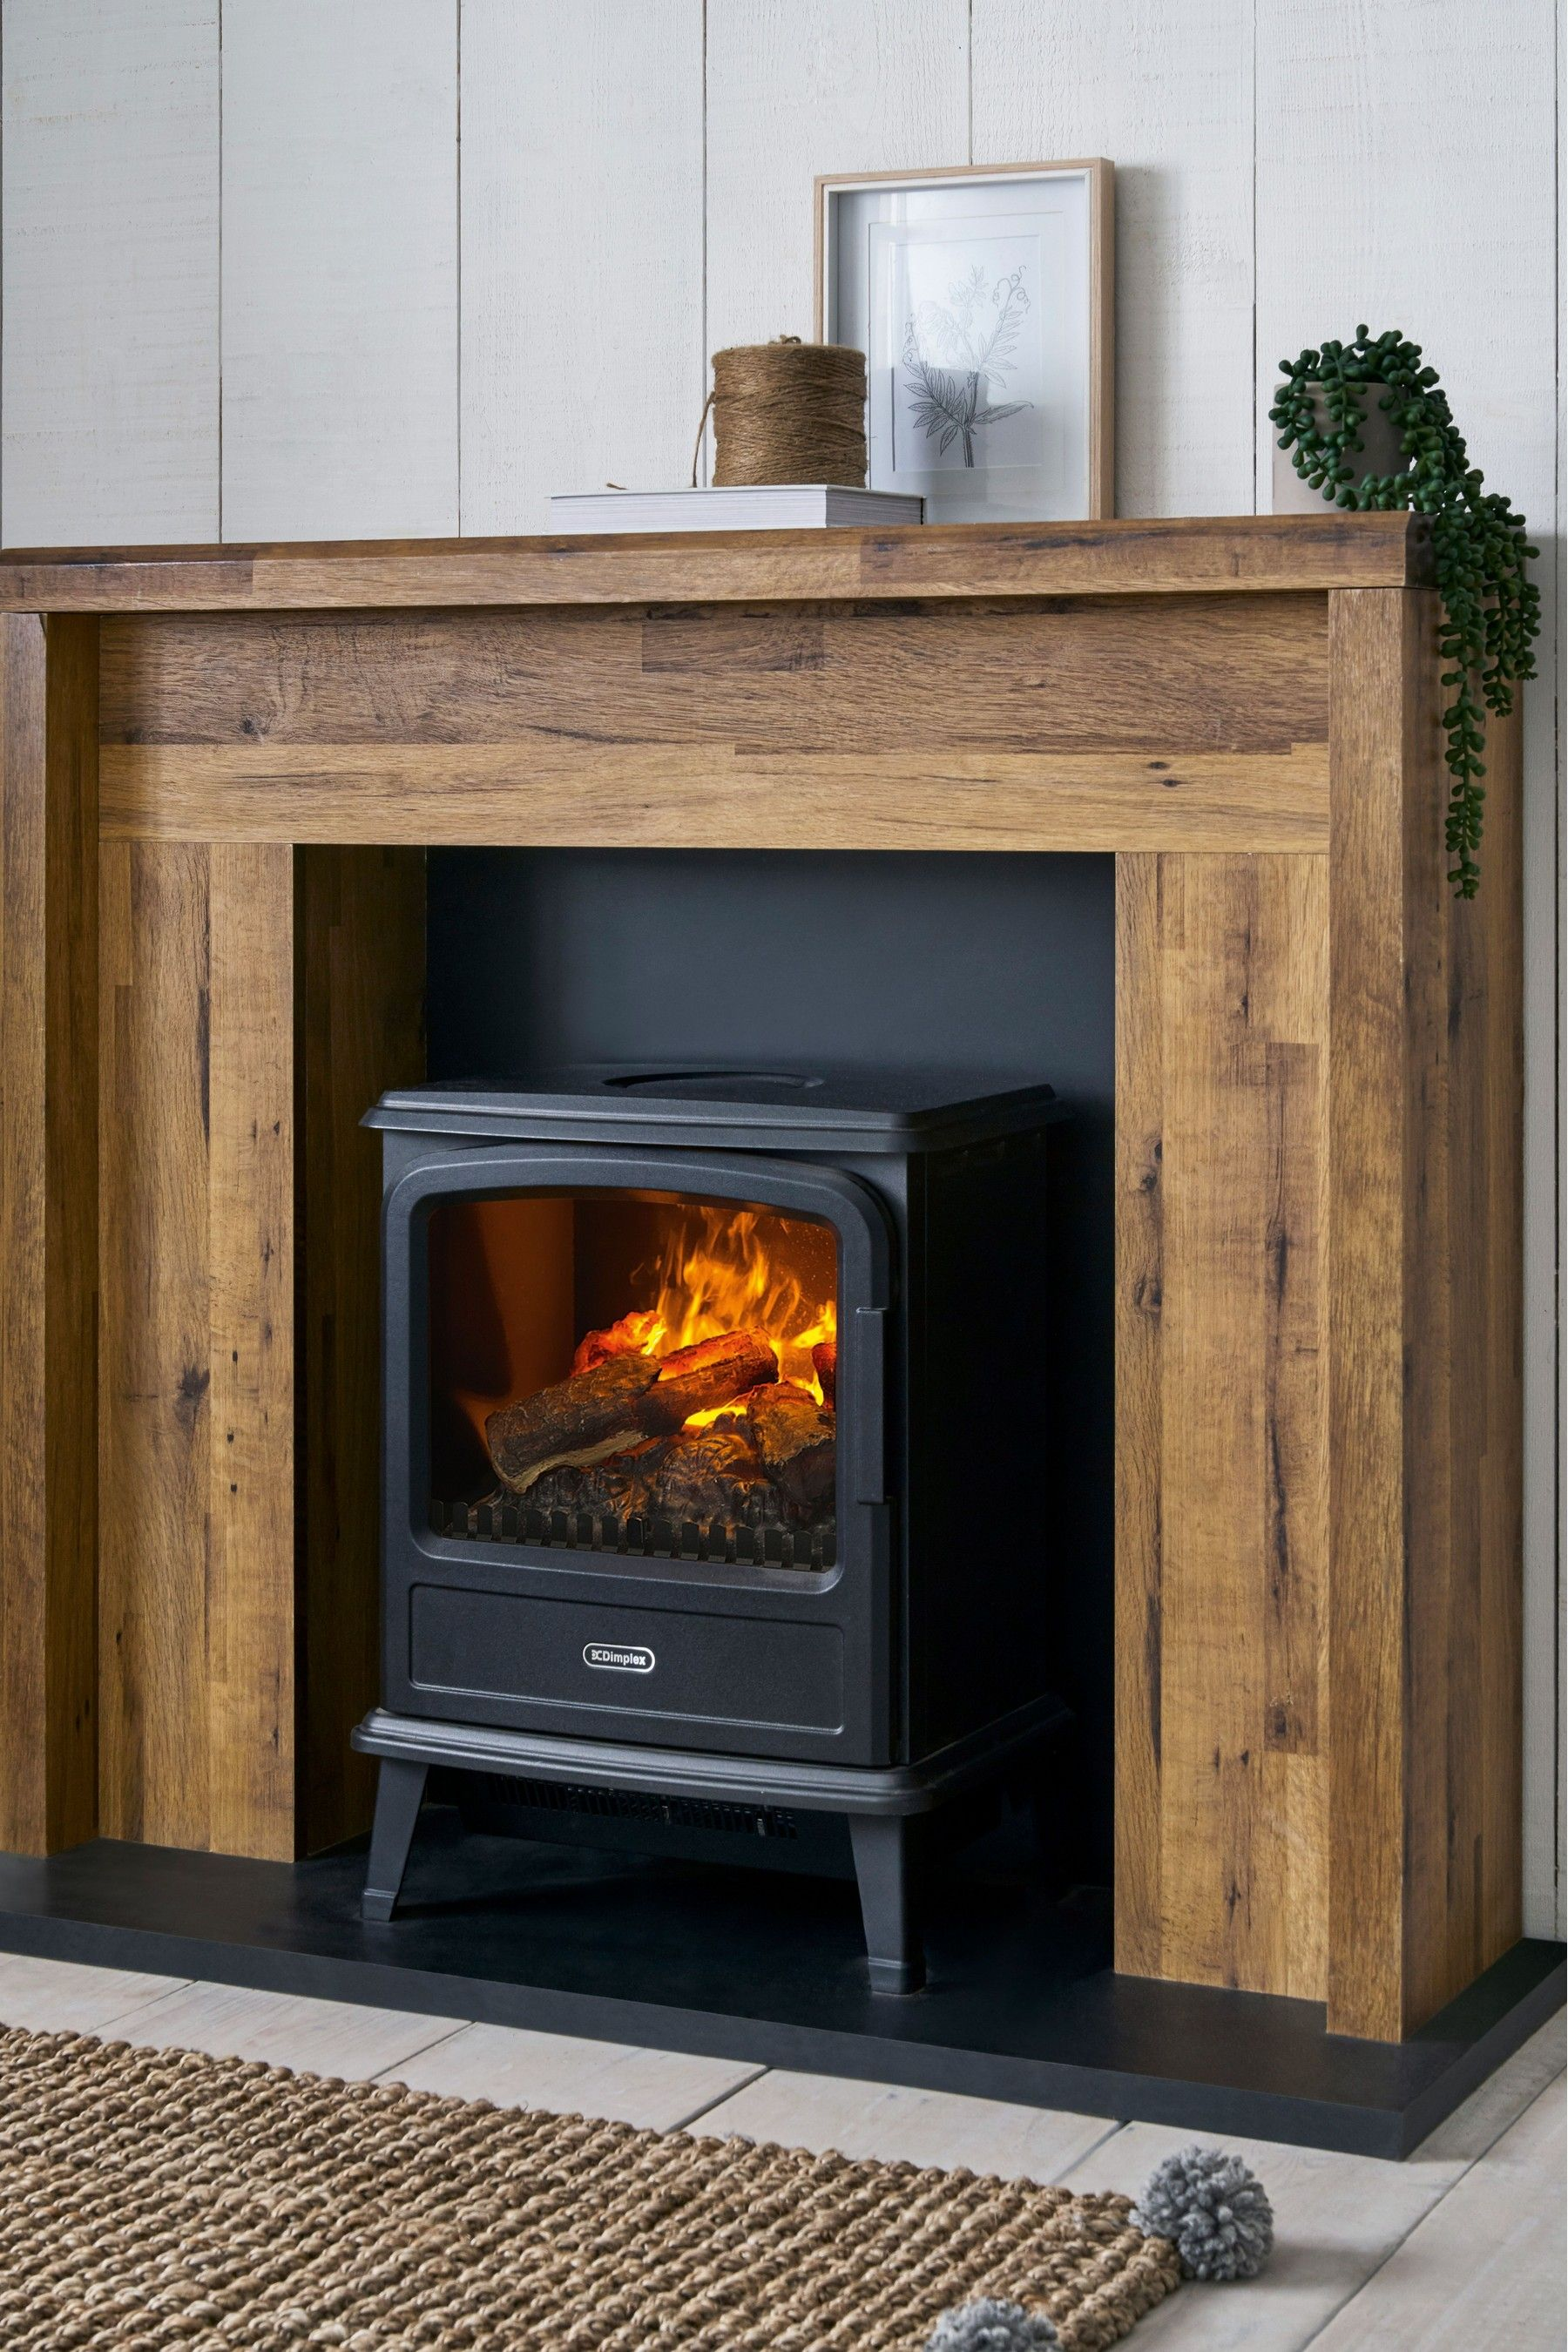 Next Bronx Fireplace Surround Natural Fireplace